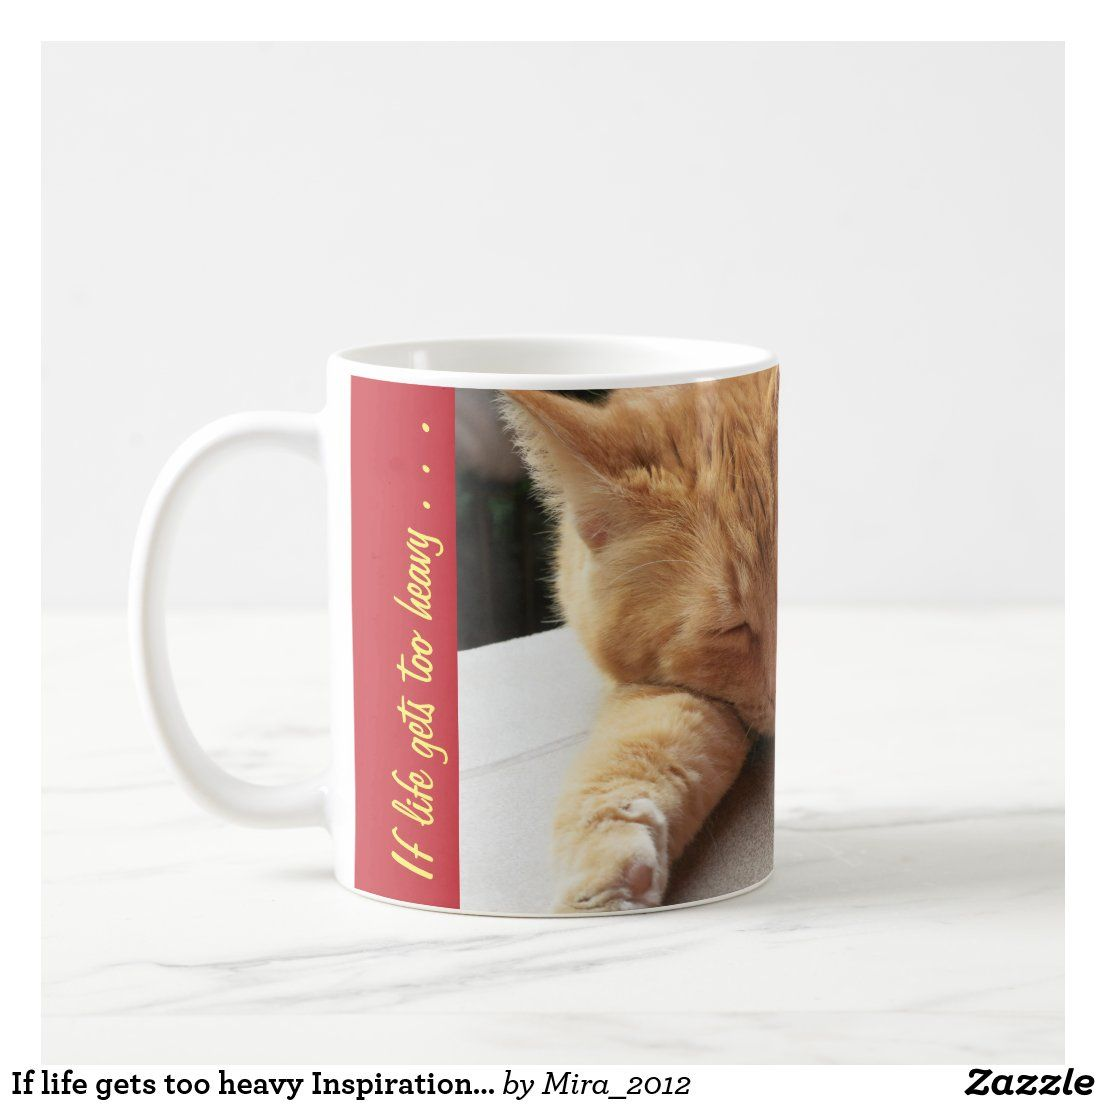 If life gets too heavy Inspirational Cat Mug 2 | Zazzle.com